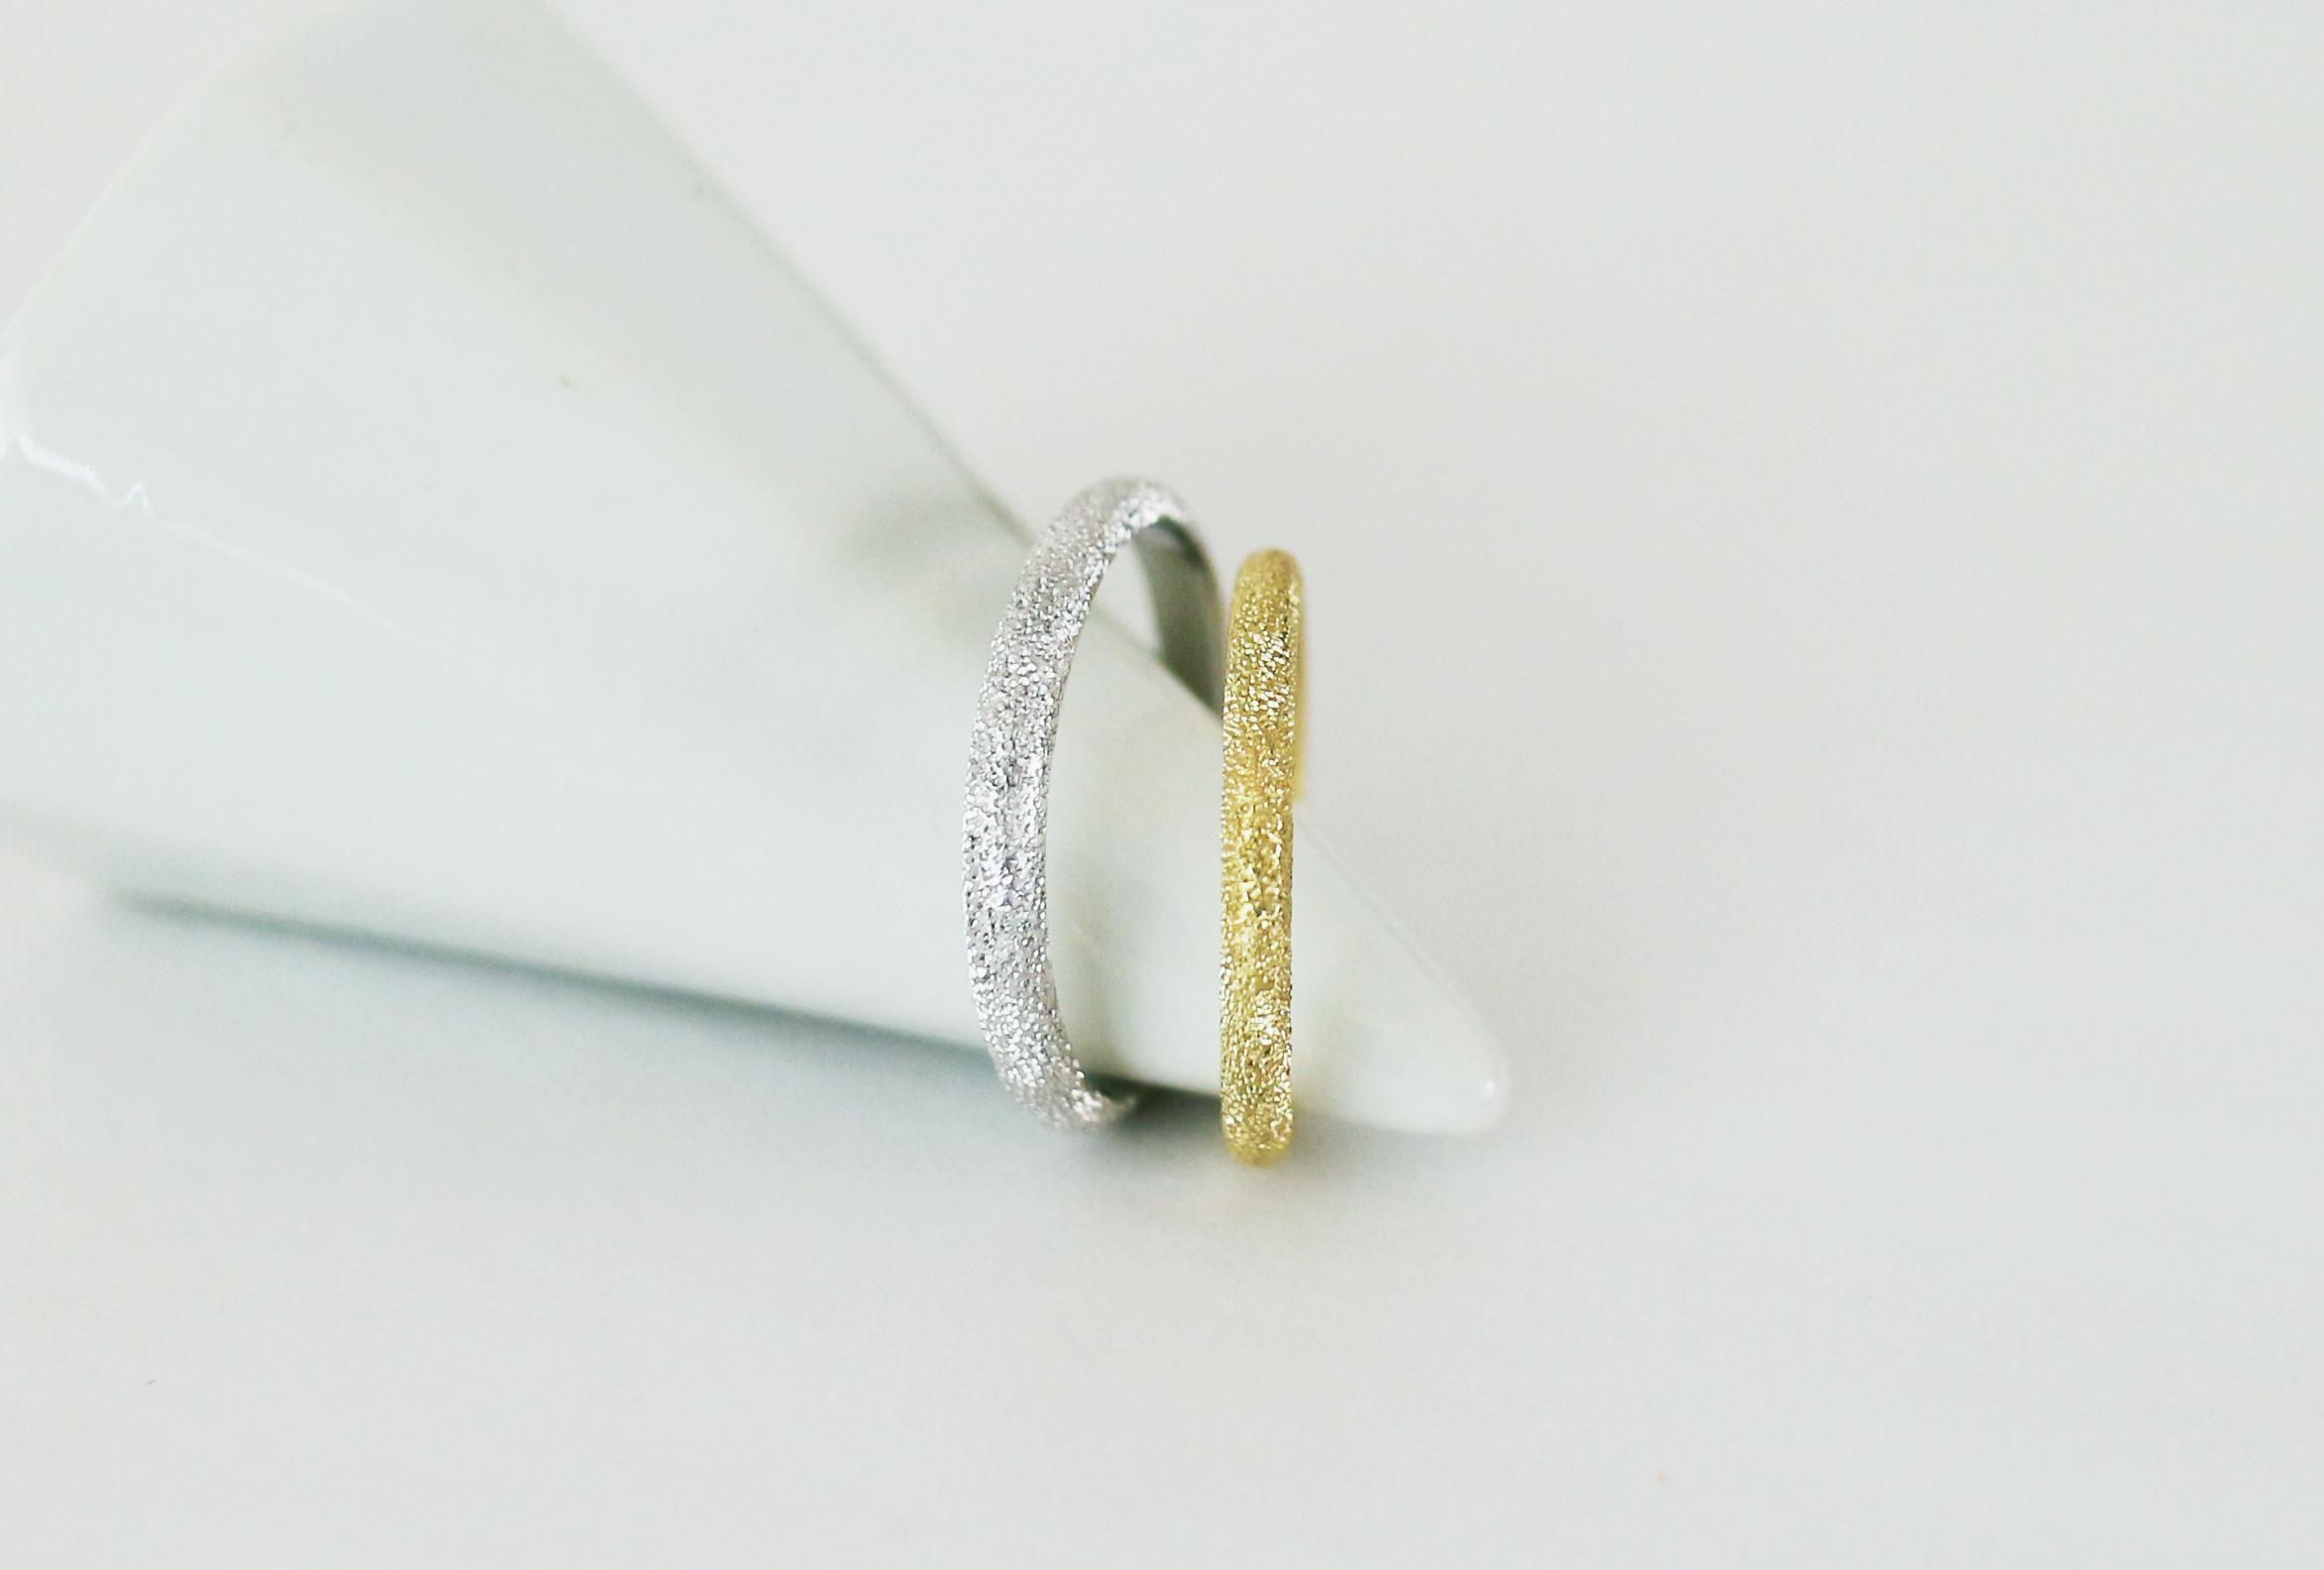 pt900/k18 スターダスト結婚指輪